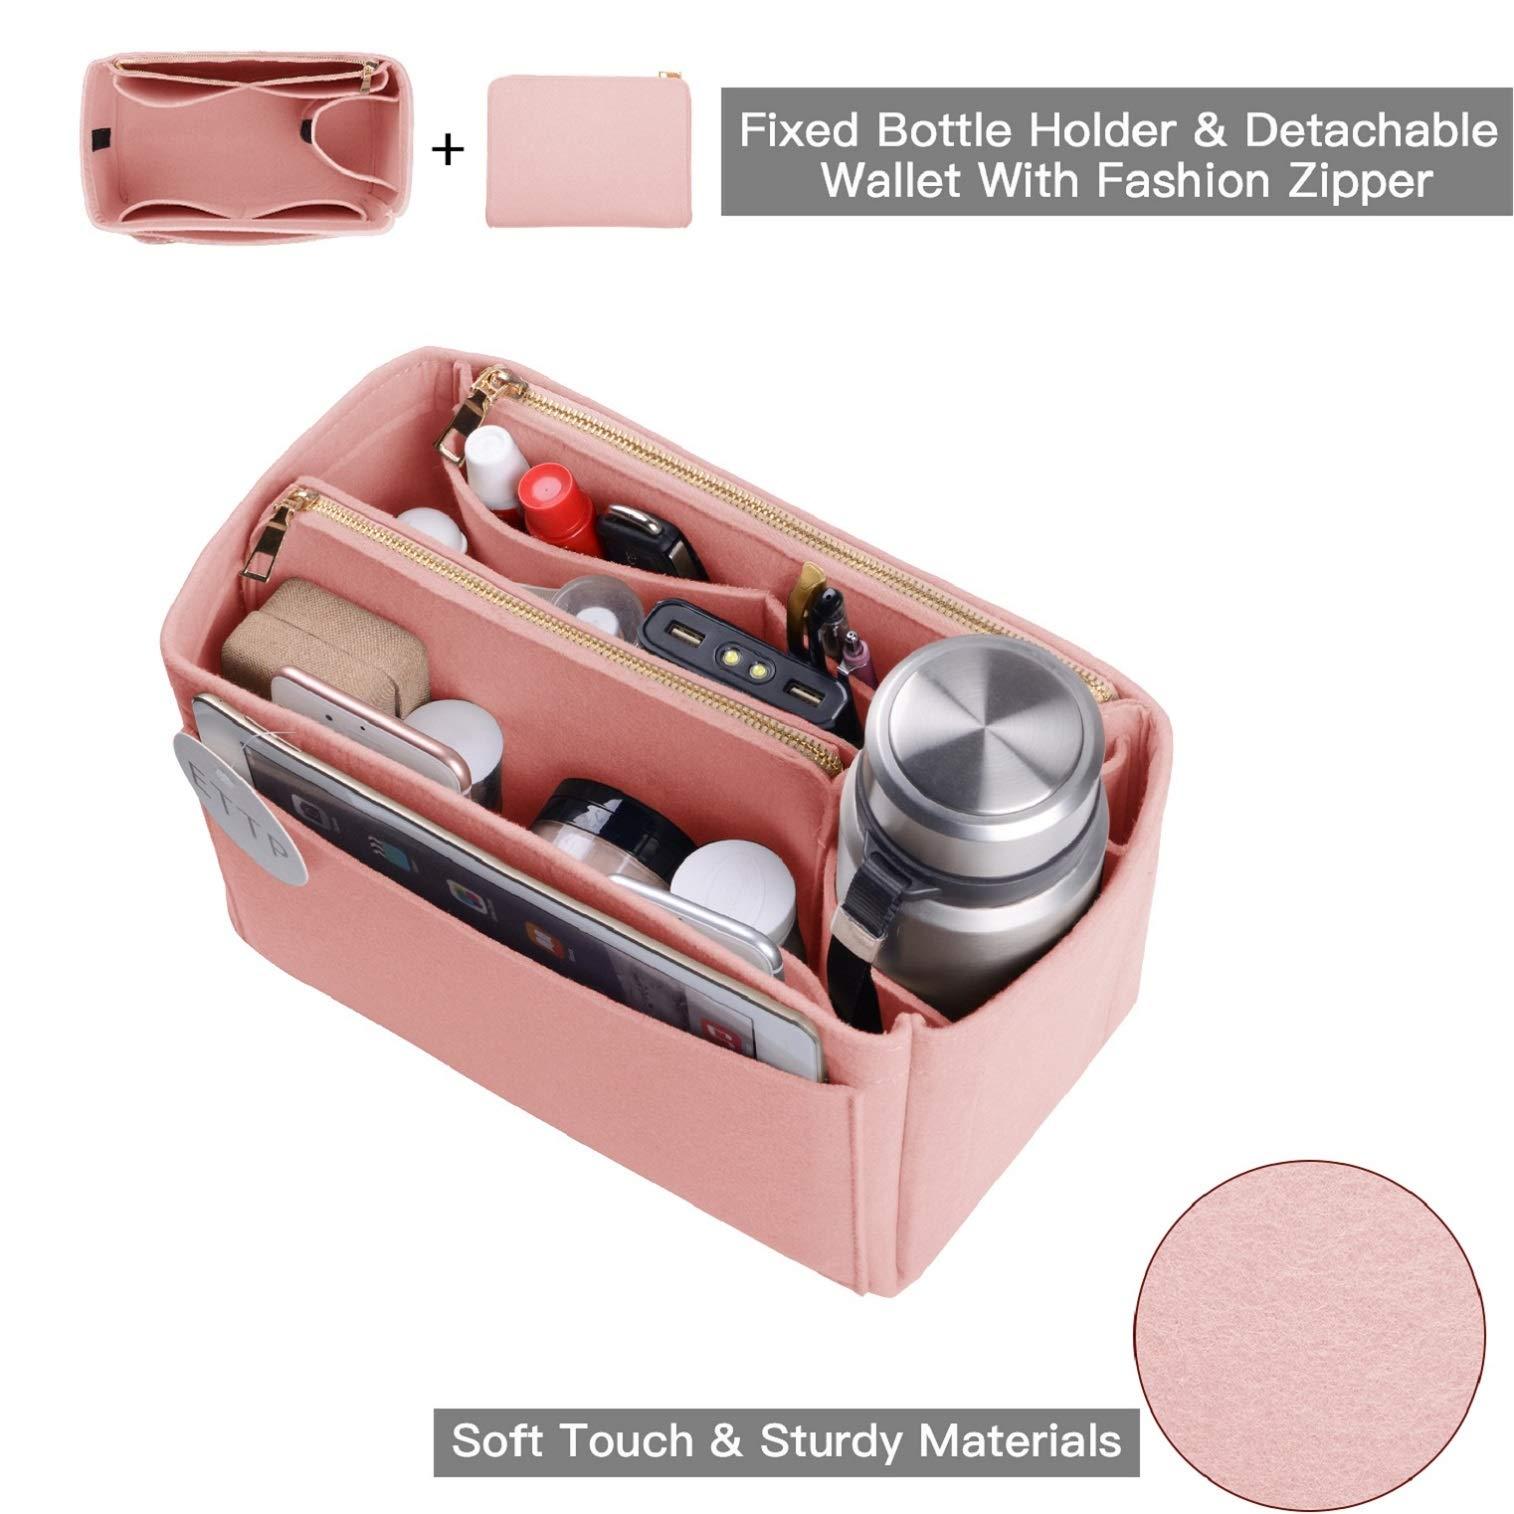 Purse Organizer, Felt Bag Organizer Insert For Speedy, Neverfull, Tote, Handbag, 6 Colors 3 Sizes (Large, Brush Pink) by ETTP